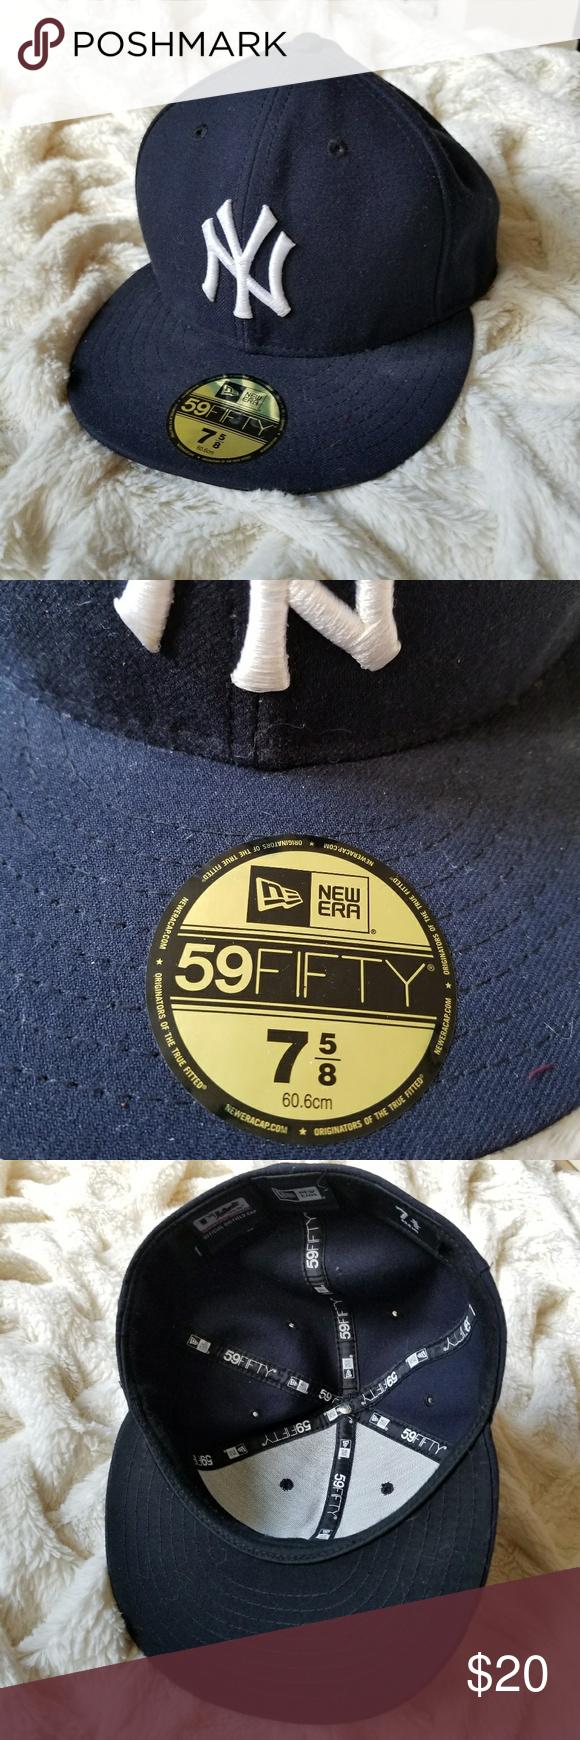 f91691bcb19 ... free shipping new era new york yankees baseball flat bill hat 21ea7  0be42